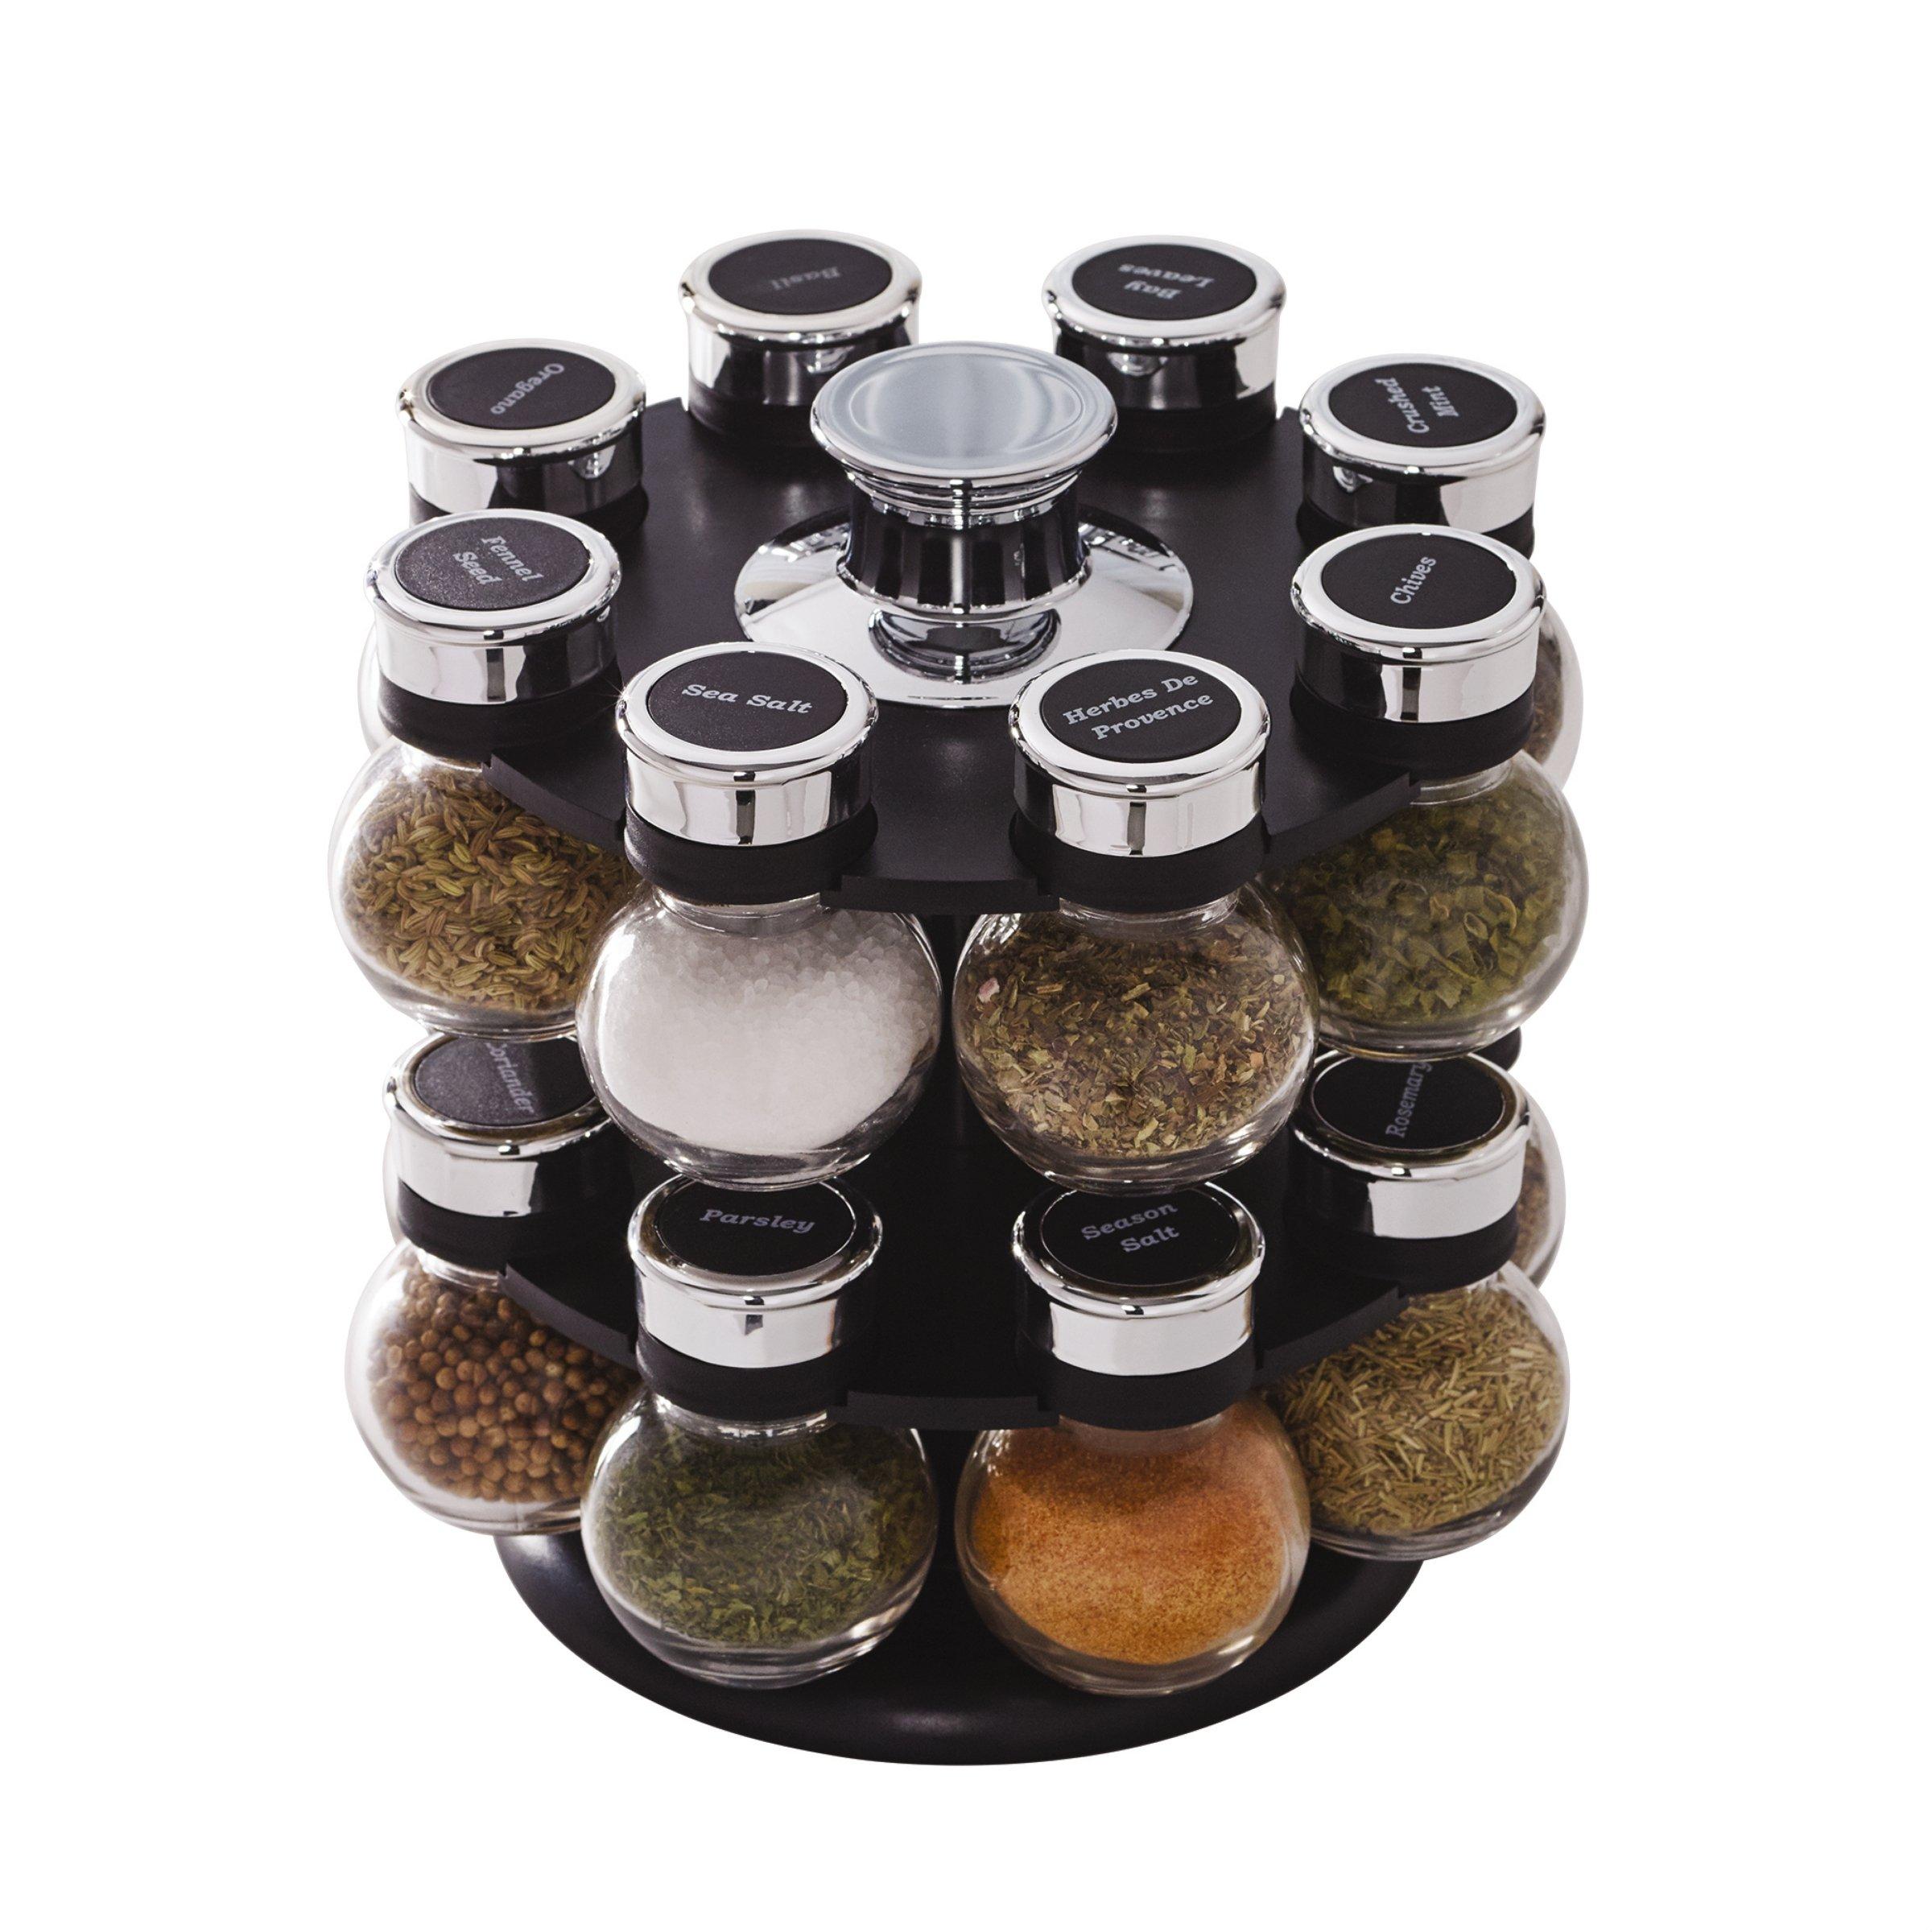 Kamenstein 5123721 Ellington 16-Jar Revolving Countertop Spice Rack Organizer with Free Spice Refills for 5 Years by Kamenstein